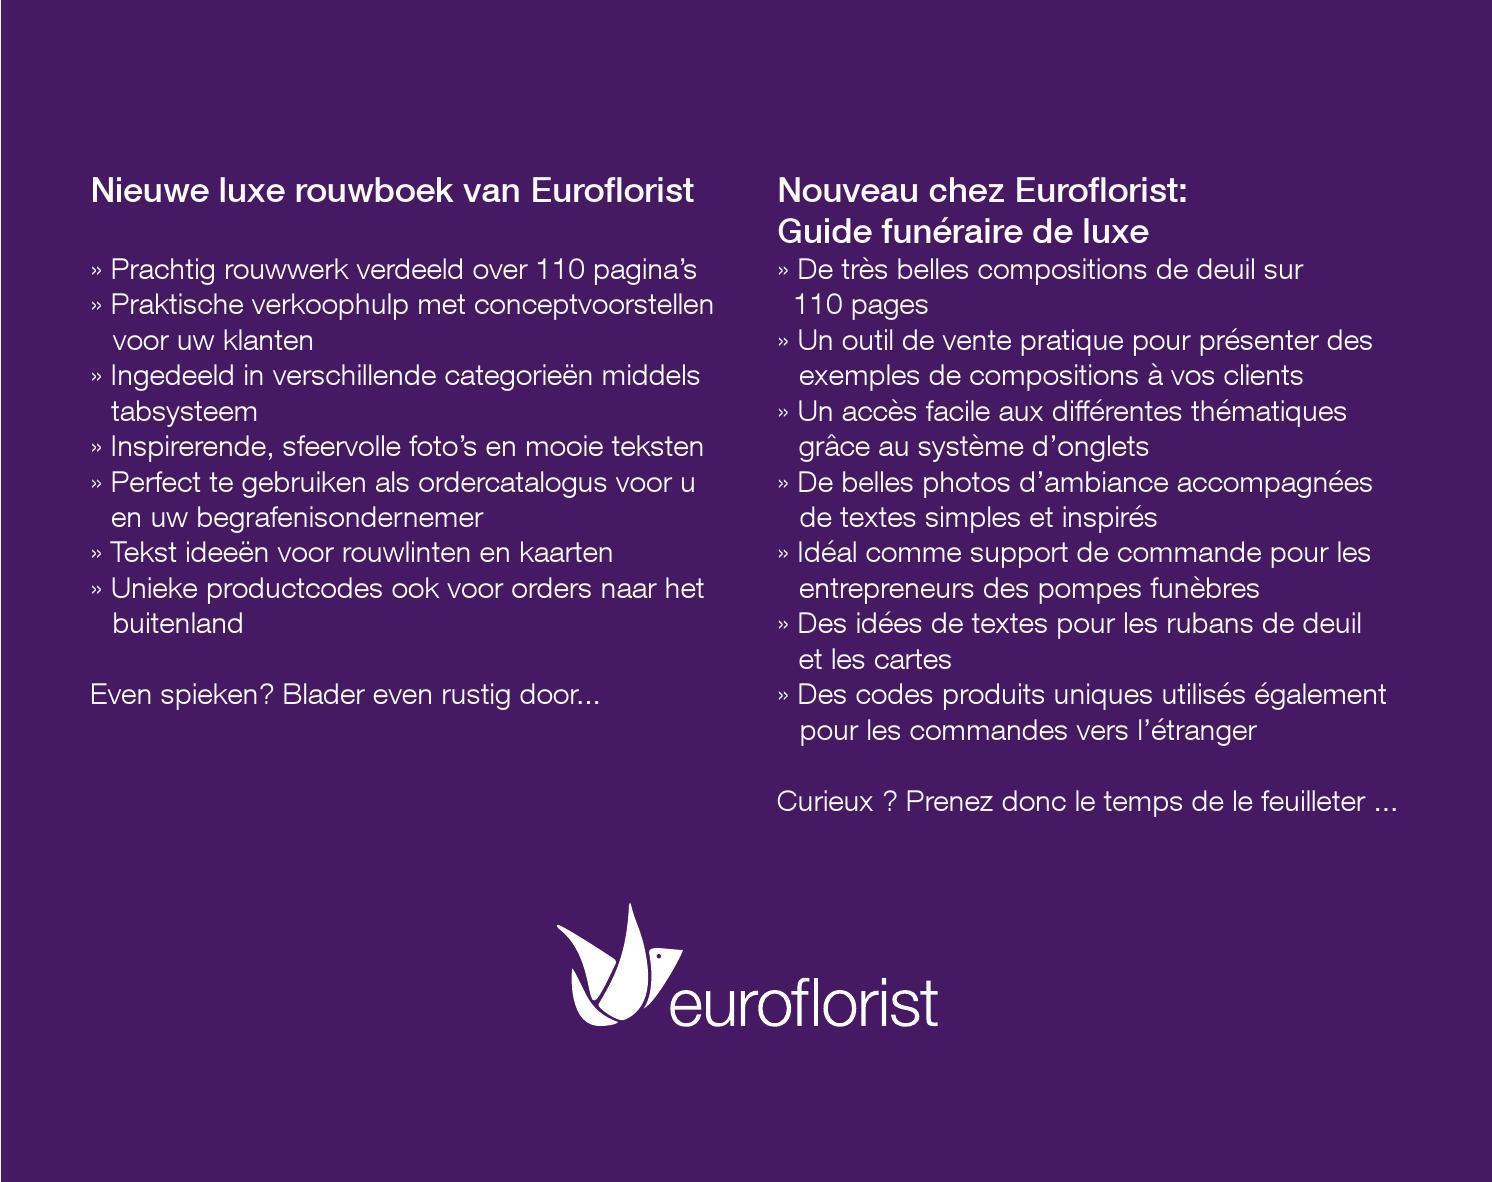 Bekend Euroflorist Rouwgids - Guide funéraire de luxe by Euroflorist - issuu EO-16